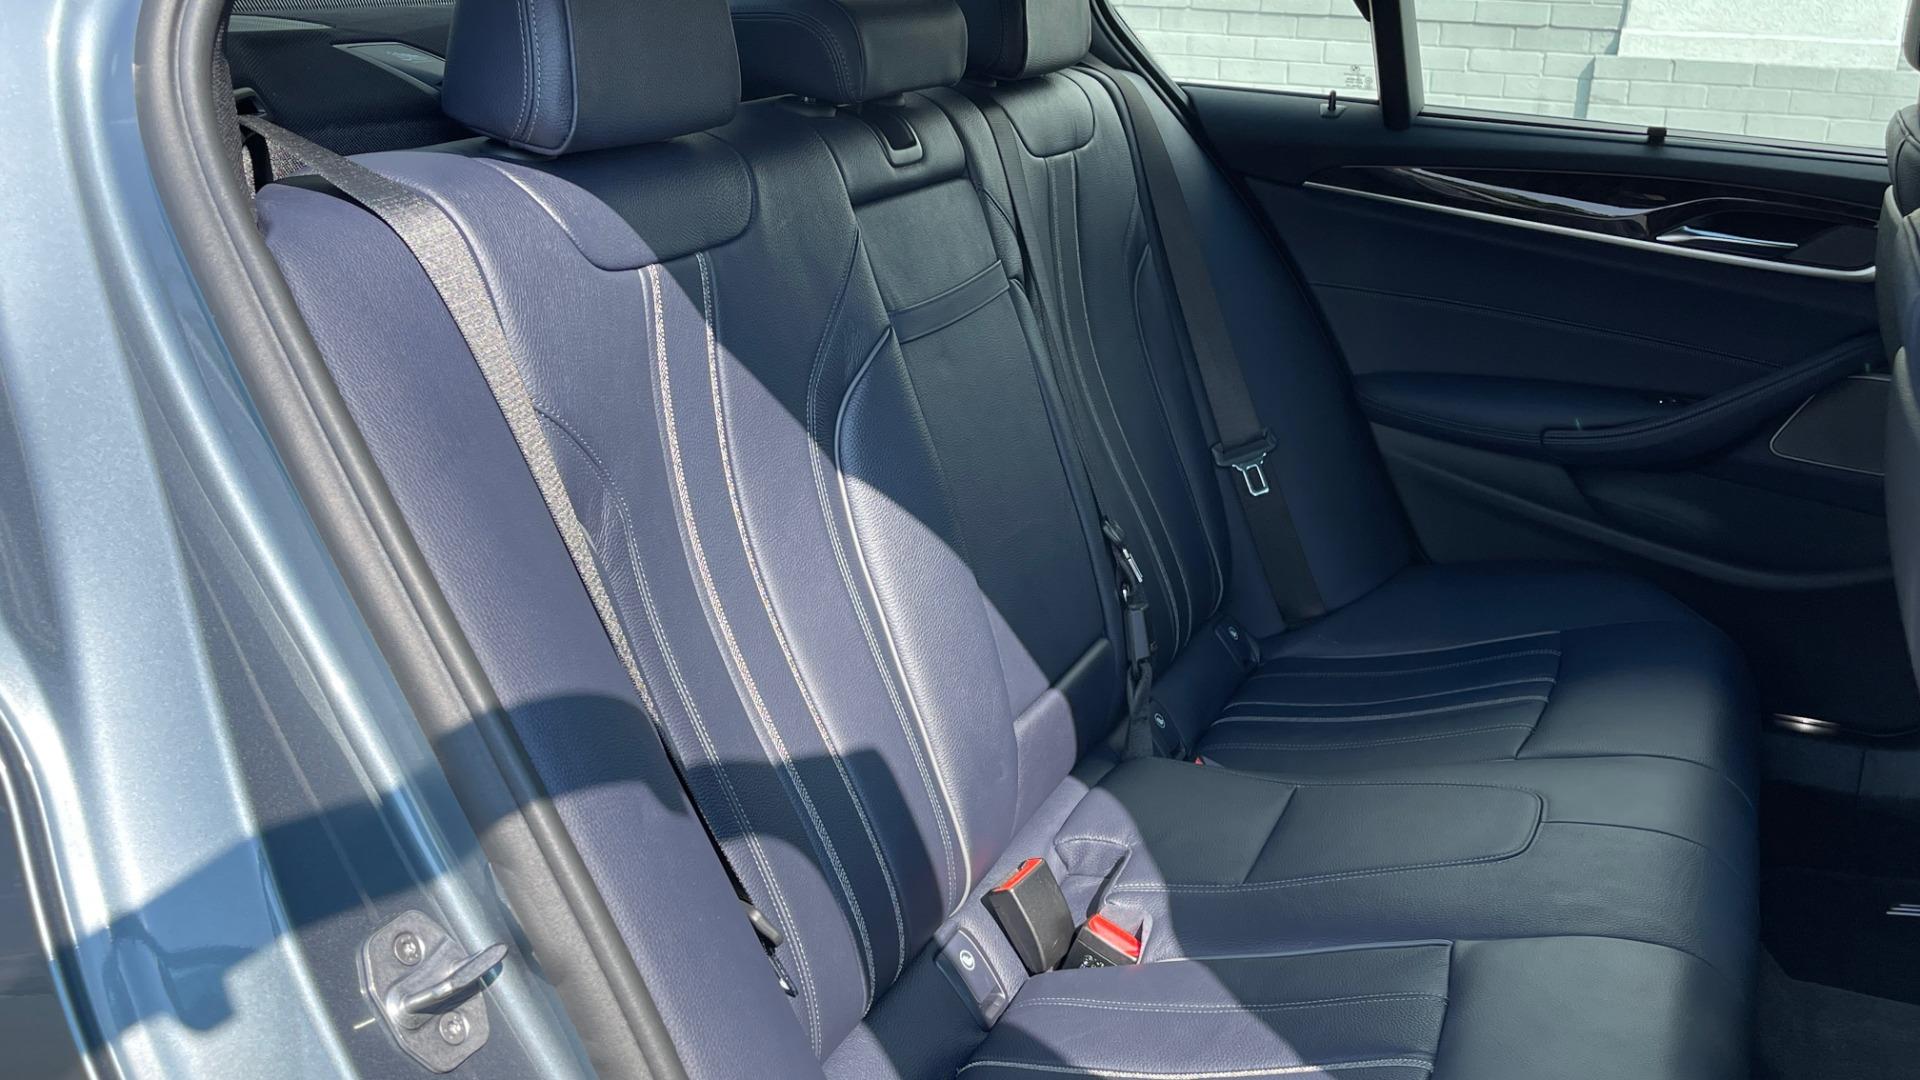 Used 2018 BMW 5 SERIES 540I XDRIVE M-SPORT / DRVR ASST / PDC / APPLE / HUD / H/K SND for sale $42,795 at Formula Imports in Charlotte NC 28227 61